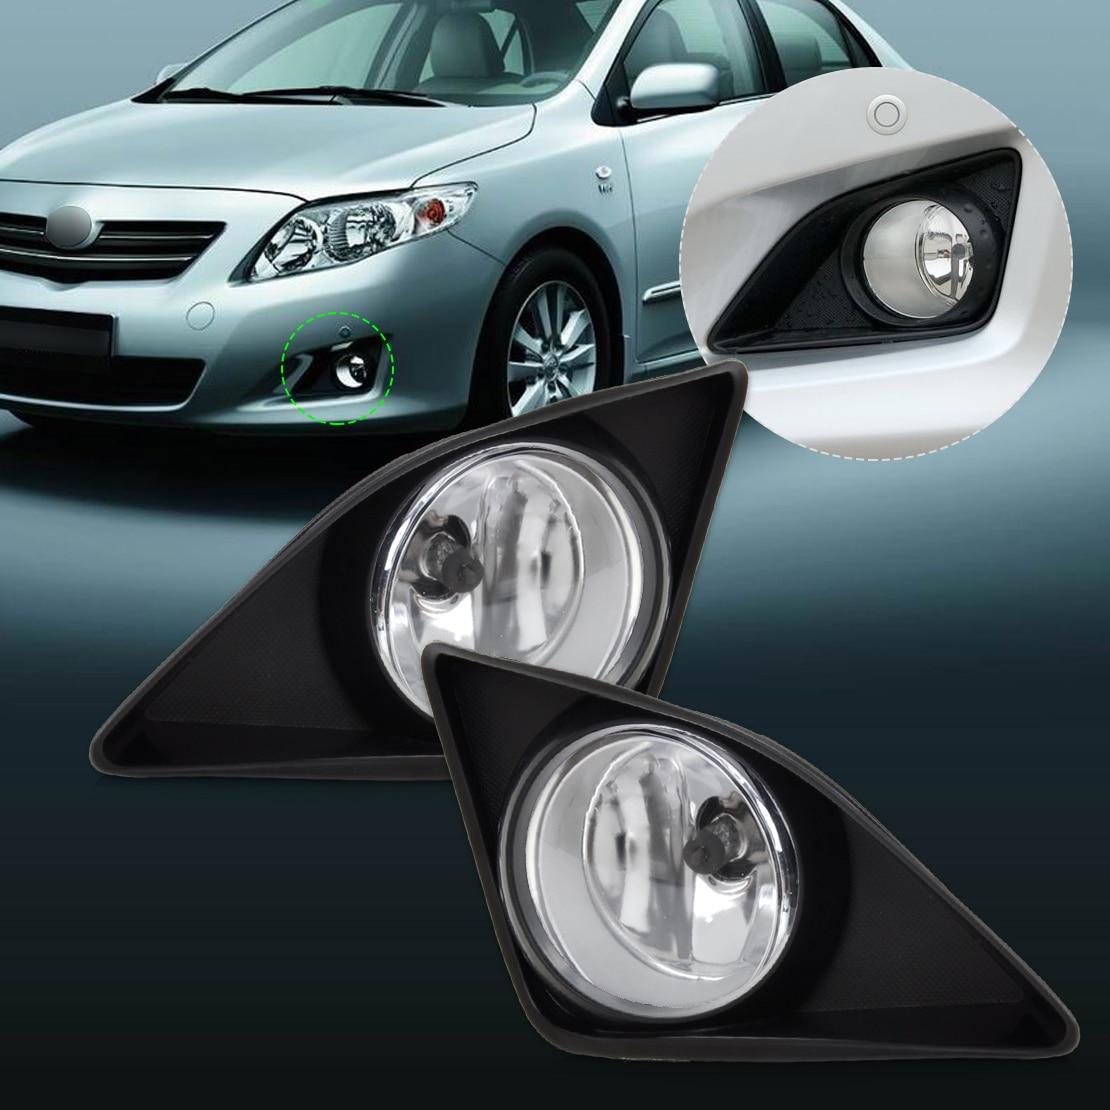 ФОТО #beler High Quality 4Pcs Front Right Left Fog Light Lamp + Grille Cover Bezel for Toyota Corolla 2007 2008 2009 2010